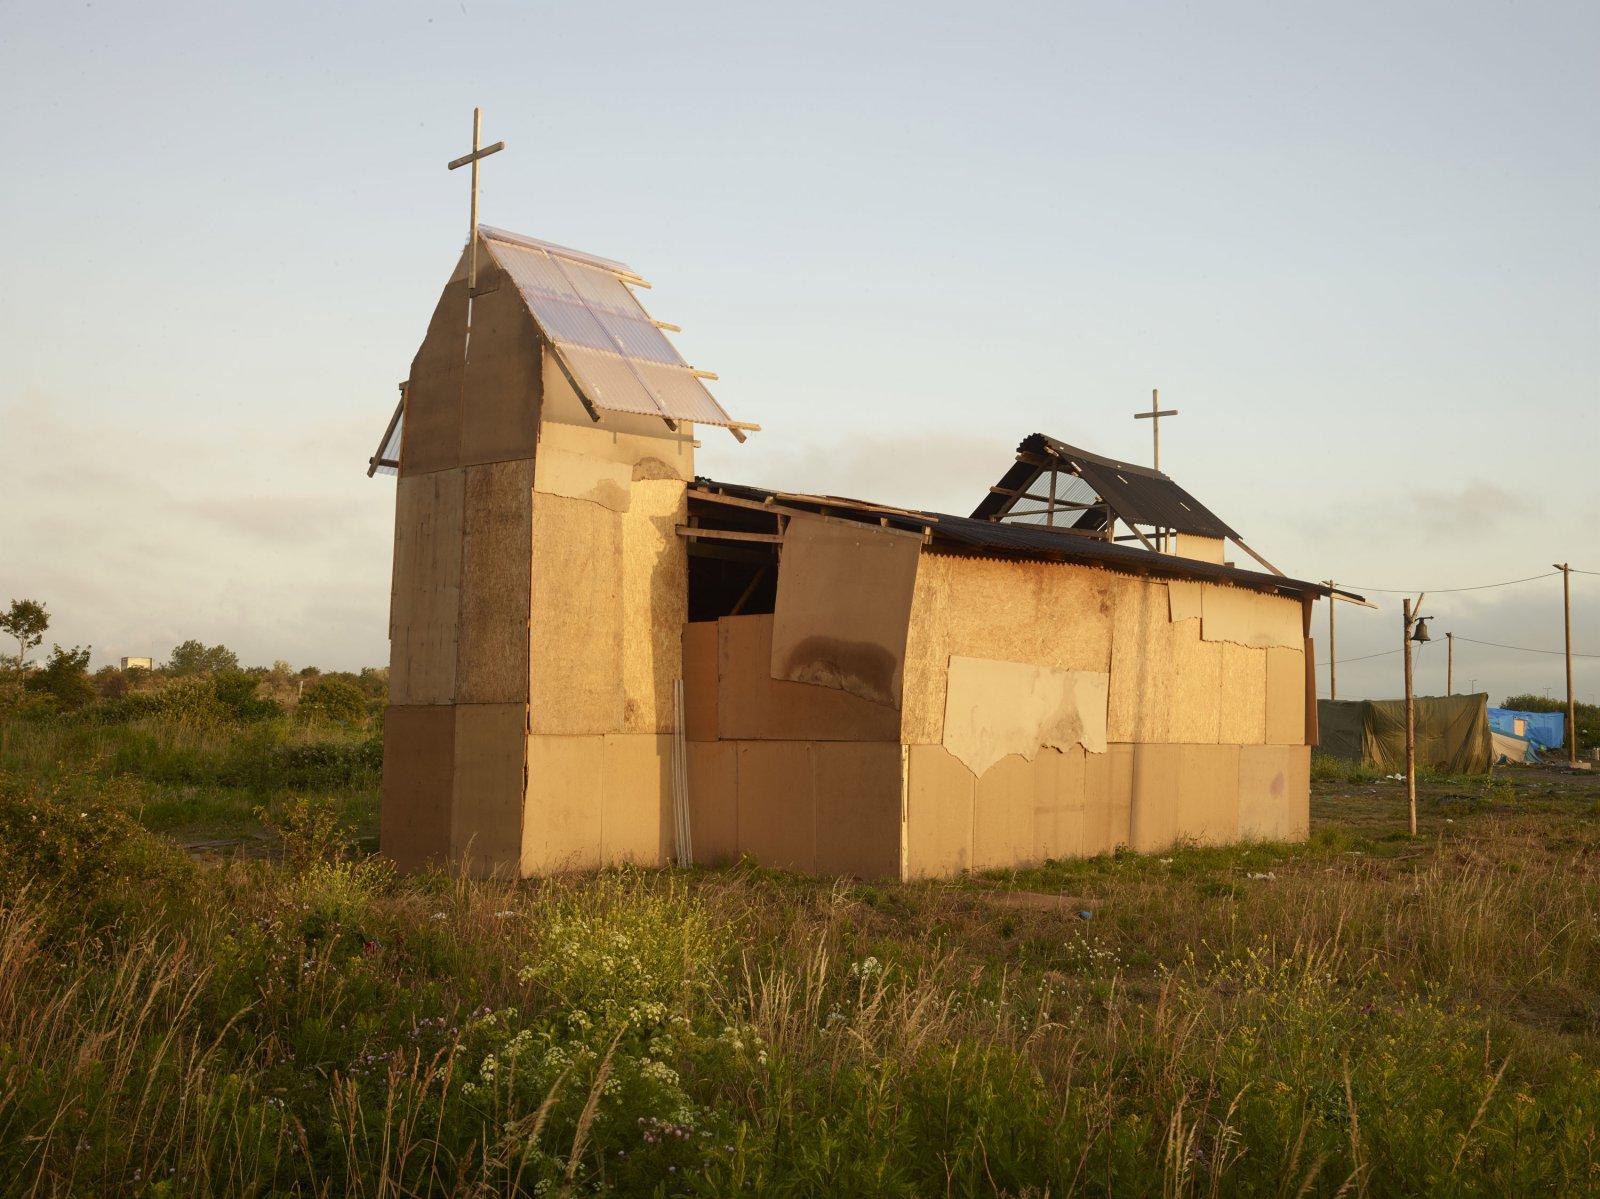 Calais, Eritrees Orthodox church, July 2015 © Henk Wildschut